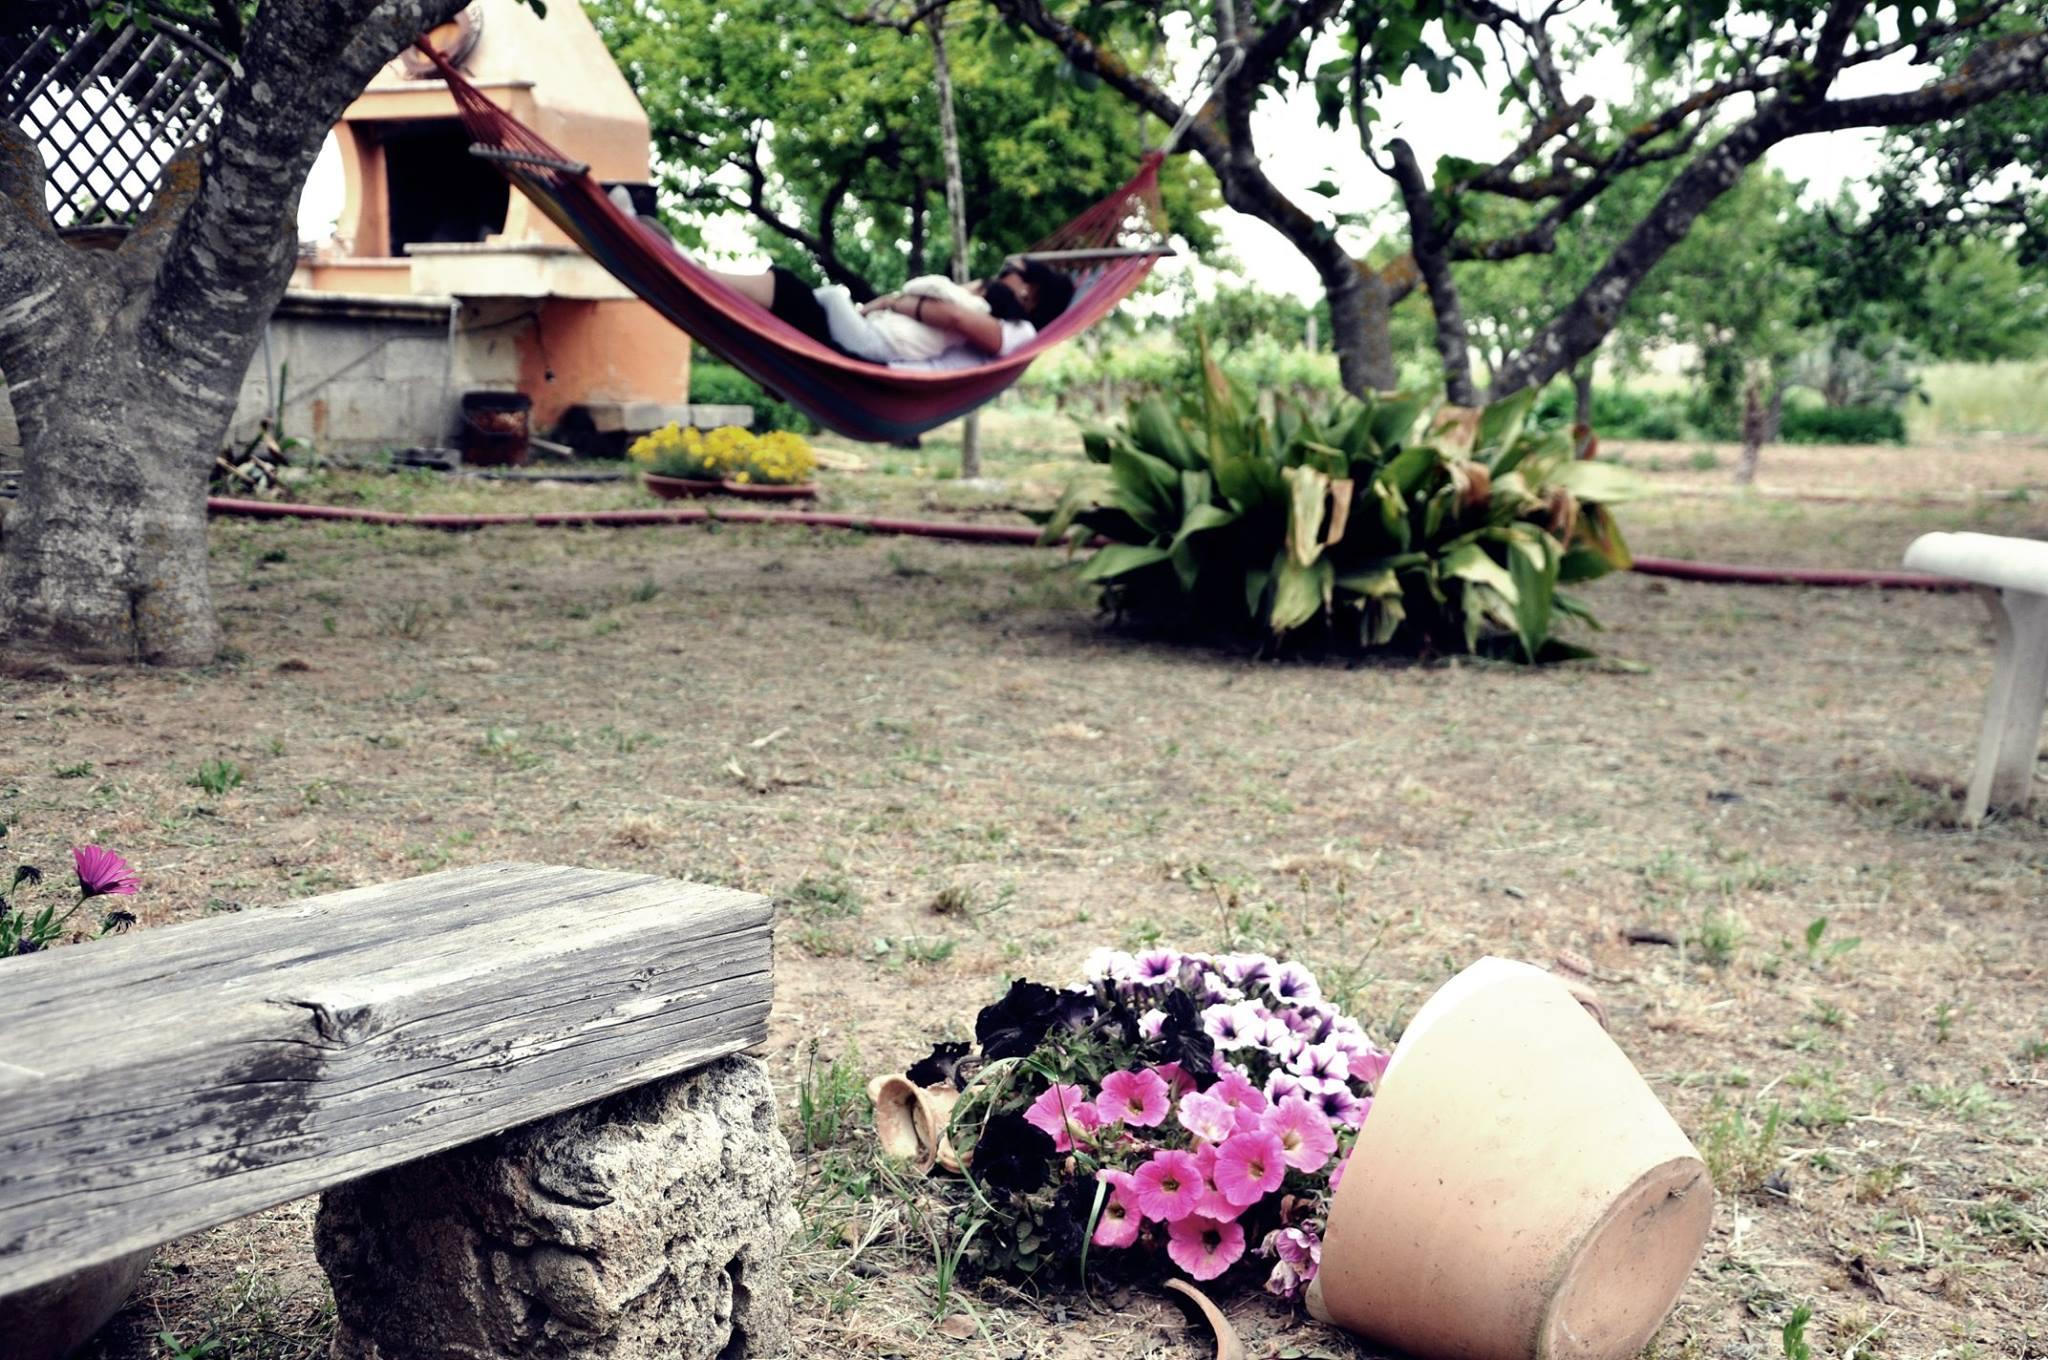 B&B -a-lu-fanizza-giardino-cutrofiano